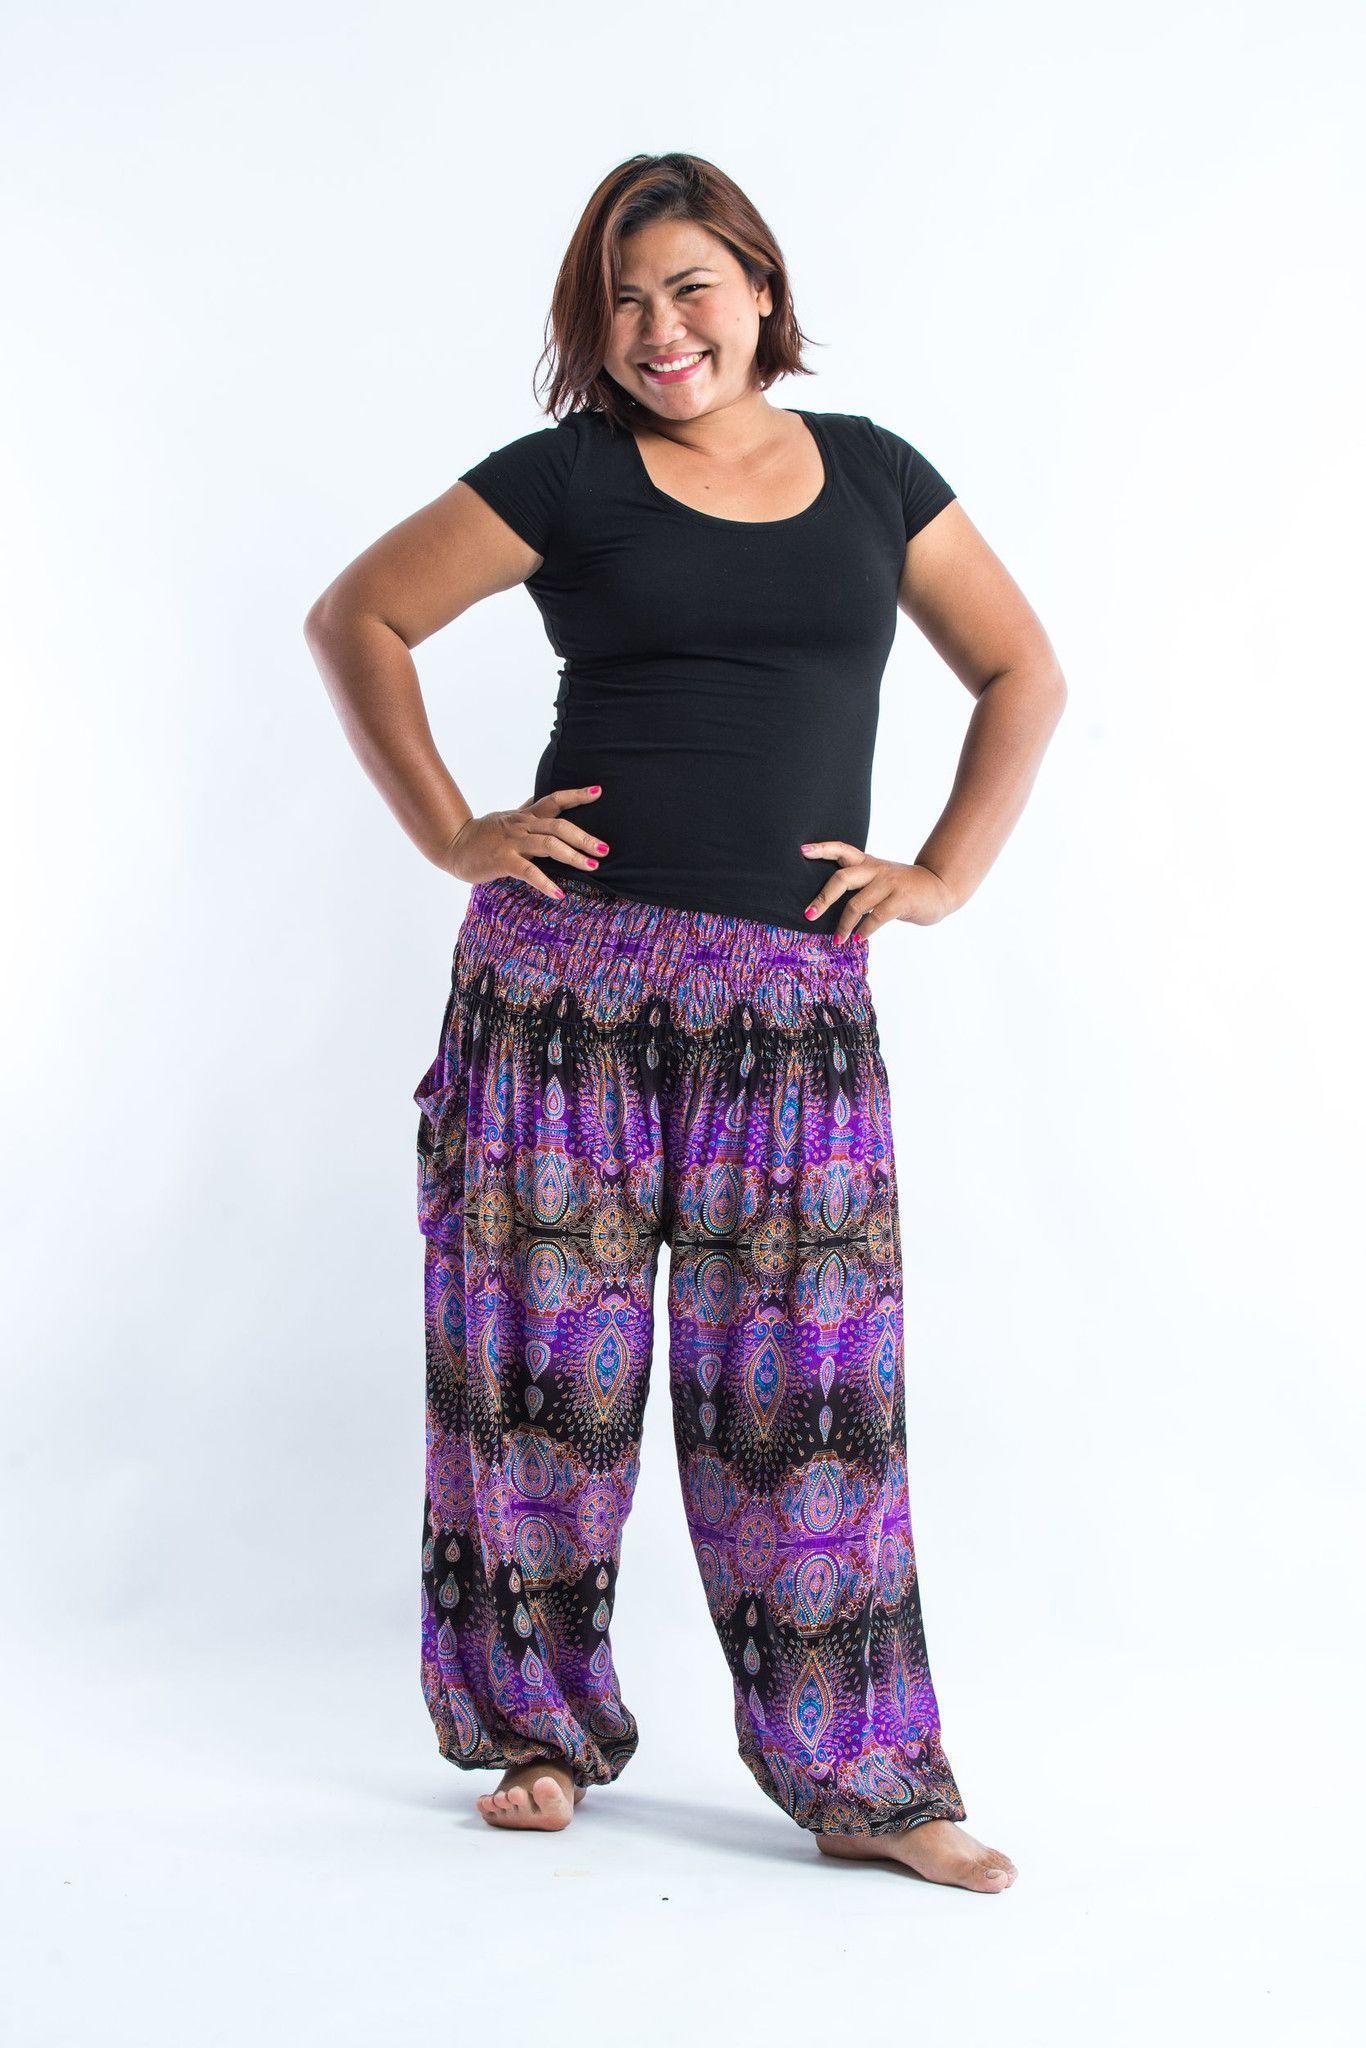 Plus Size Boho Pants Outfit